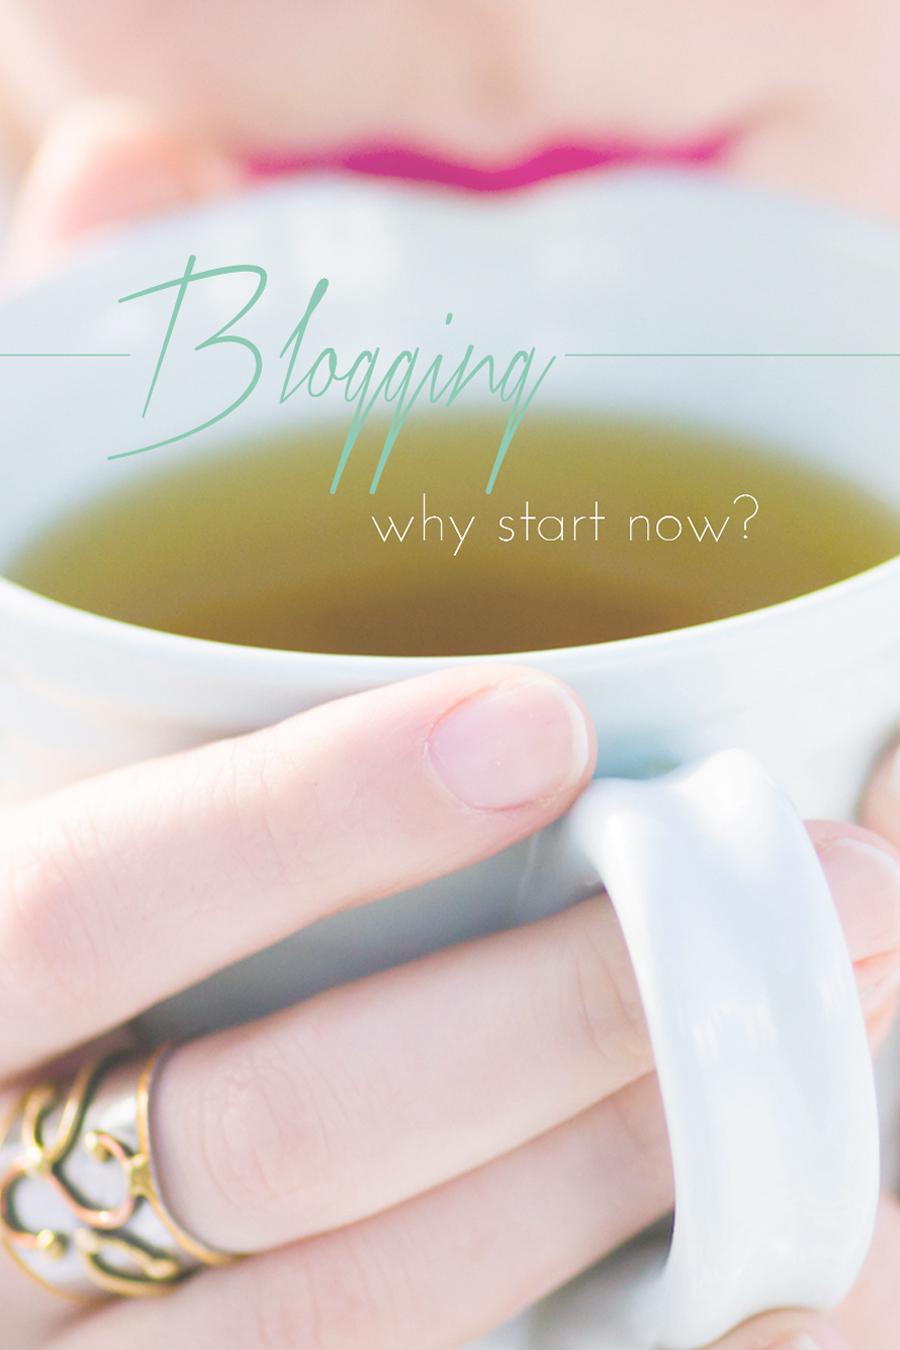 Blogging-whystartnow.jpg